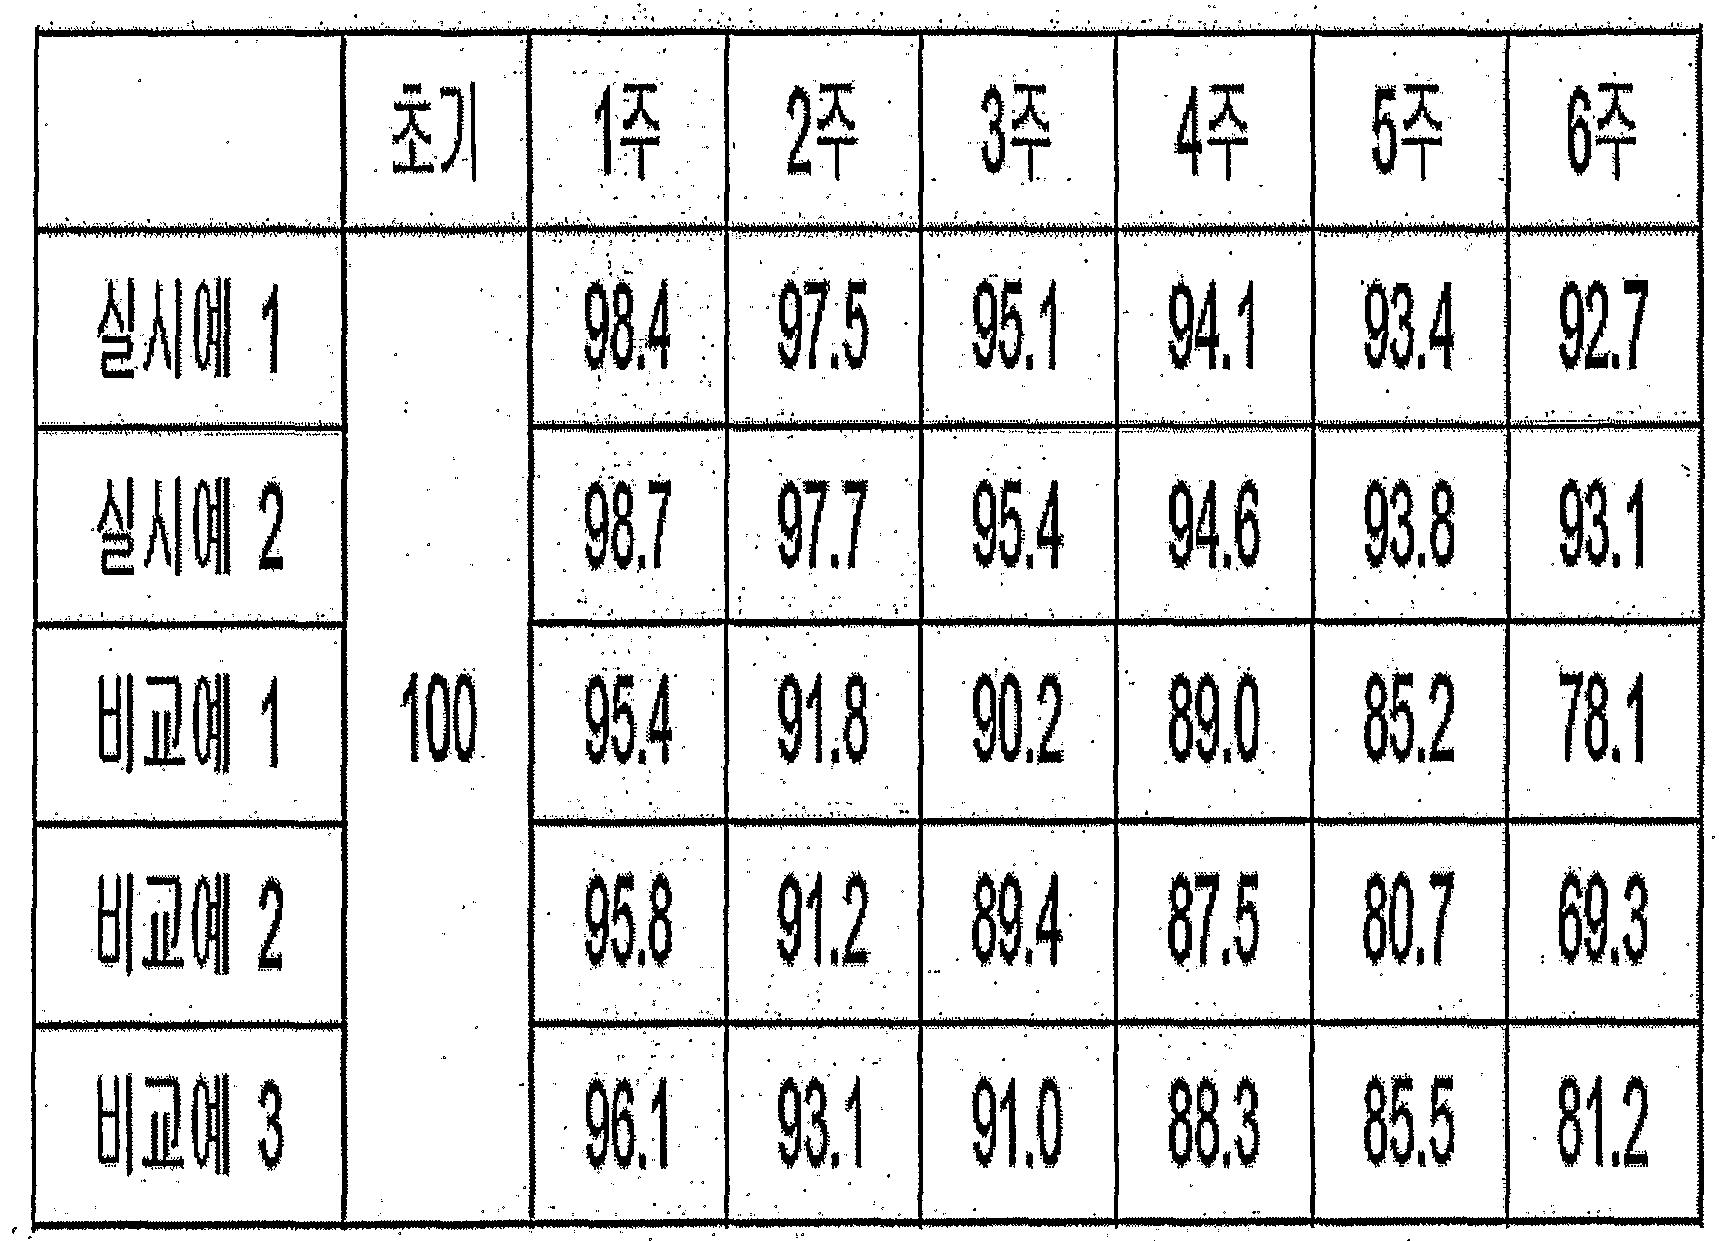 Figure WO-DOC-FIGURE-169